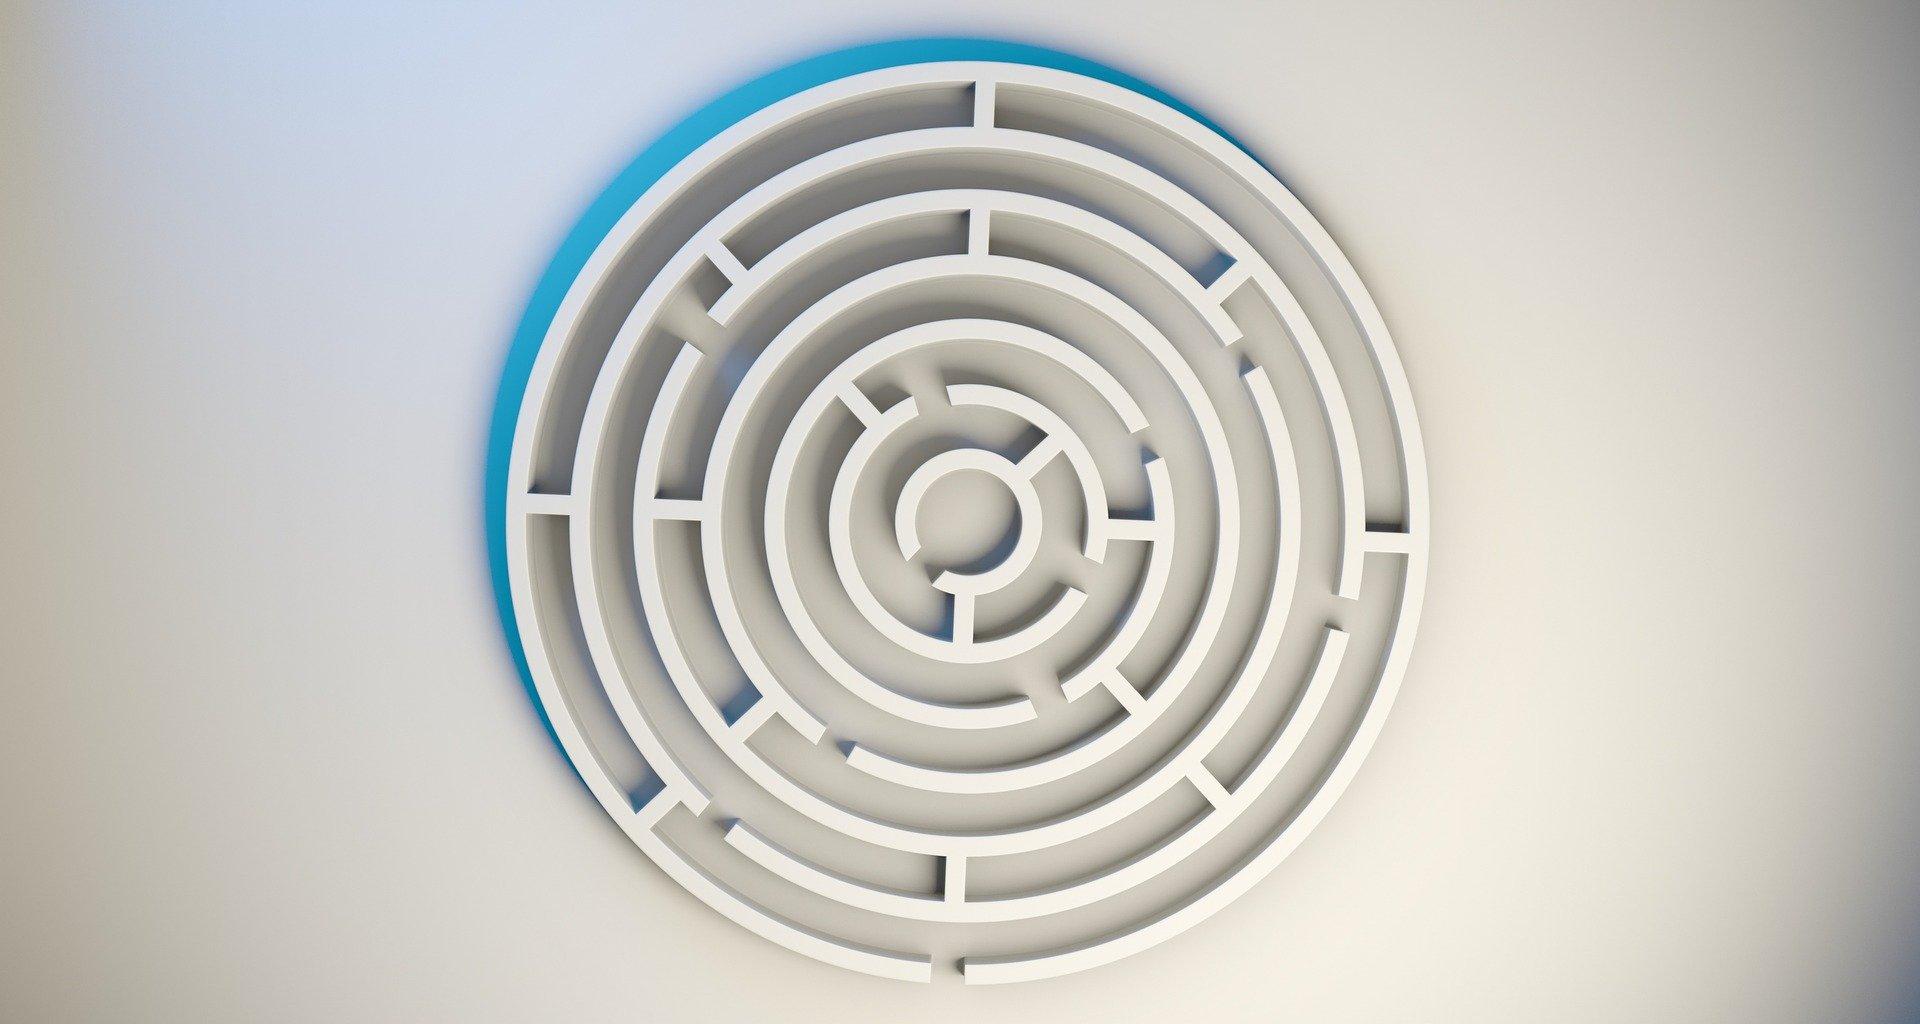 labyrinth1872669_1920.jpg